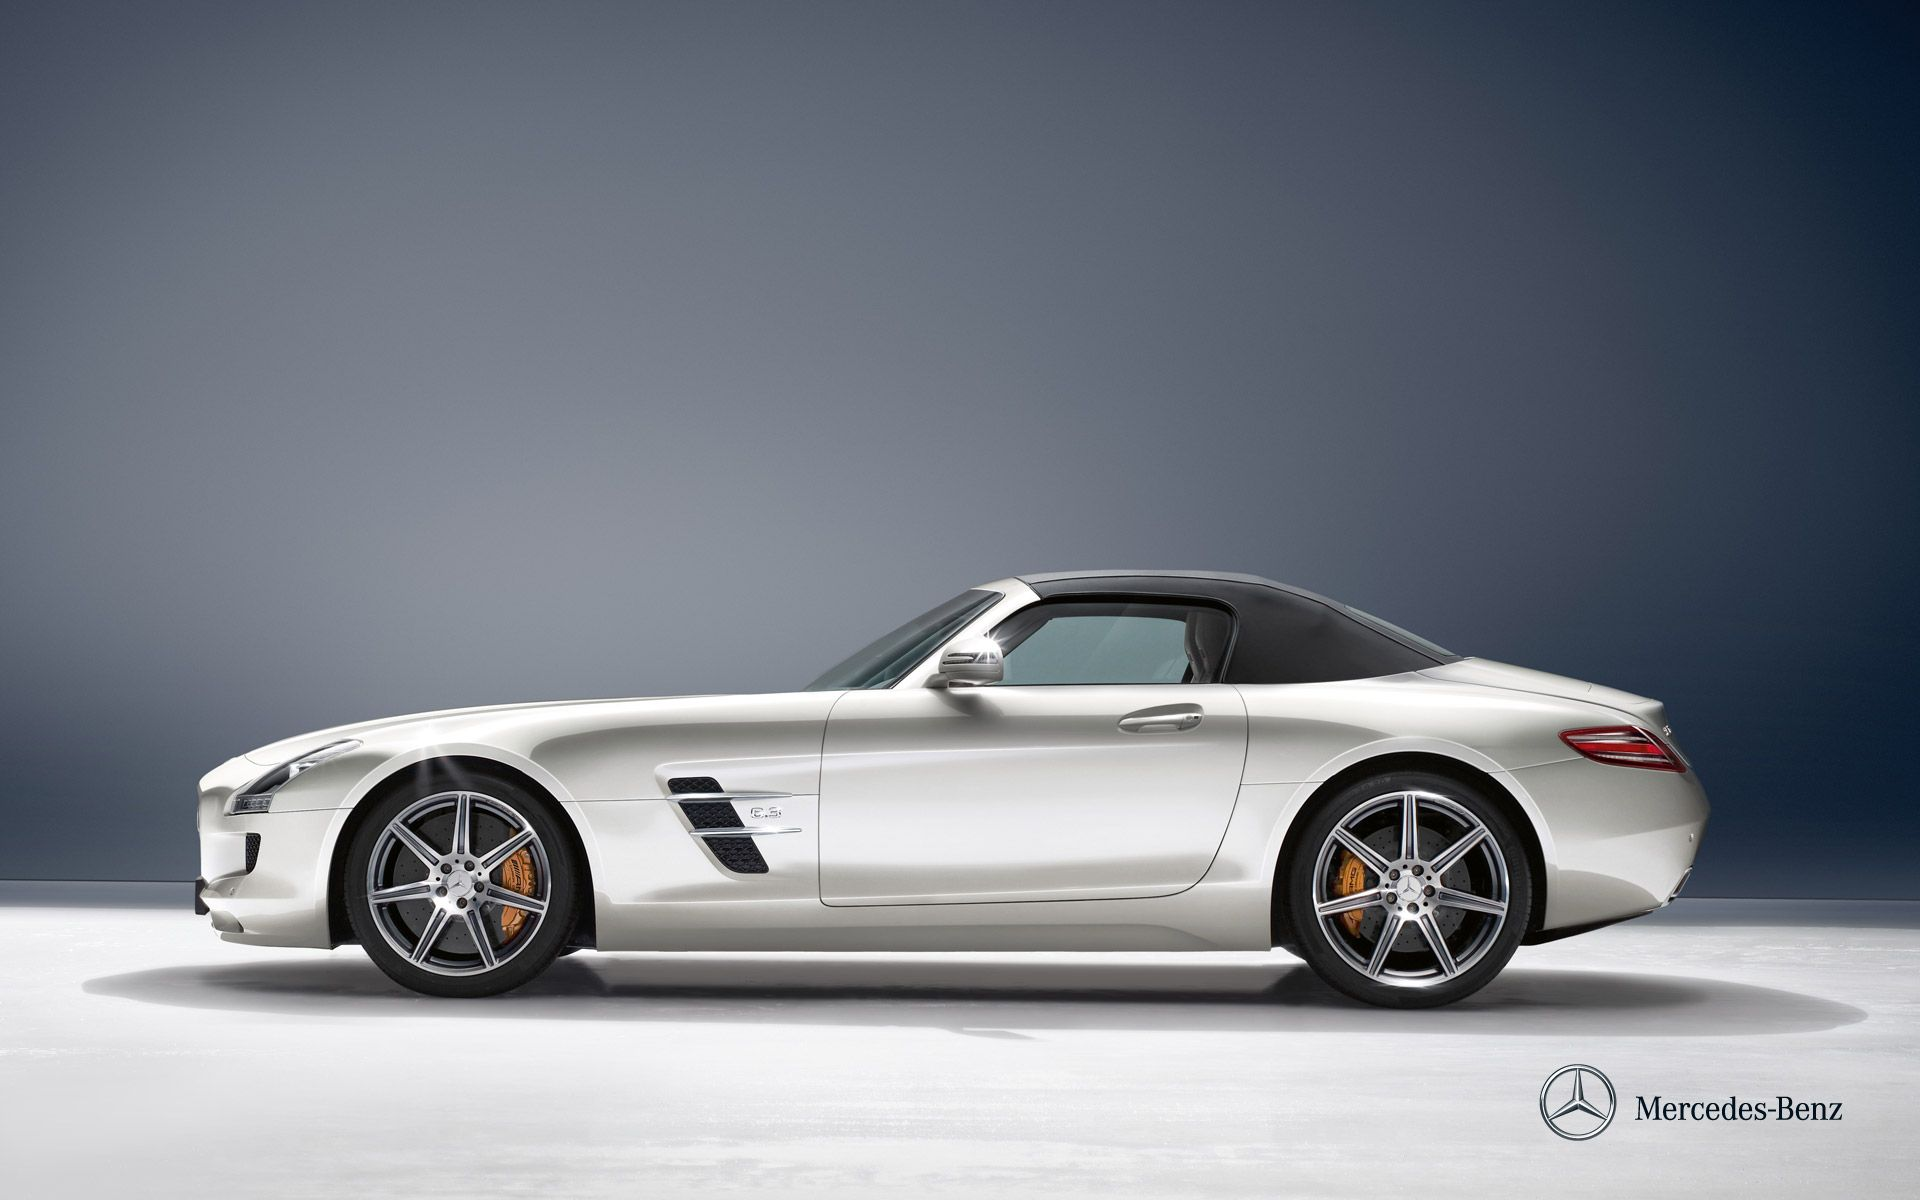 Mercedes Benz Sls Amg Roadster Wallpaper Though Its Sheetmetal